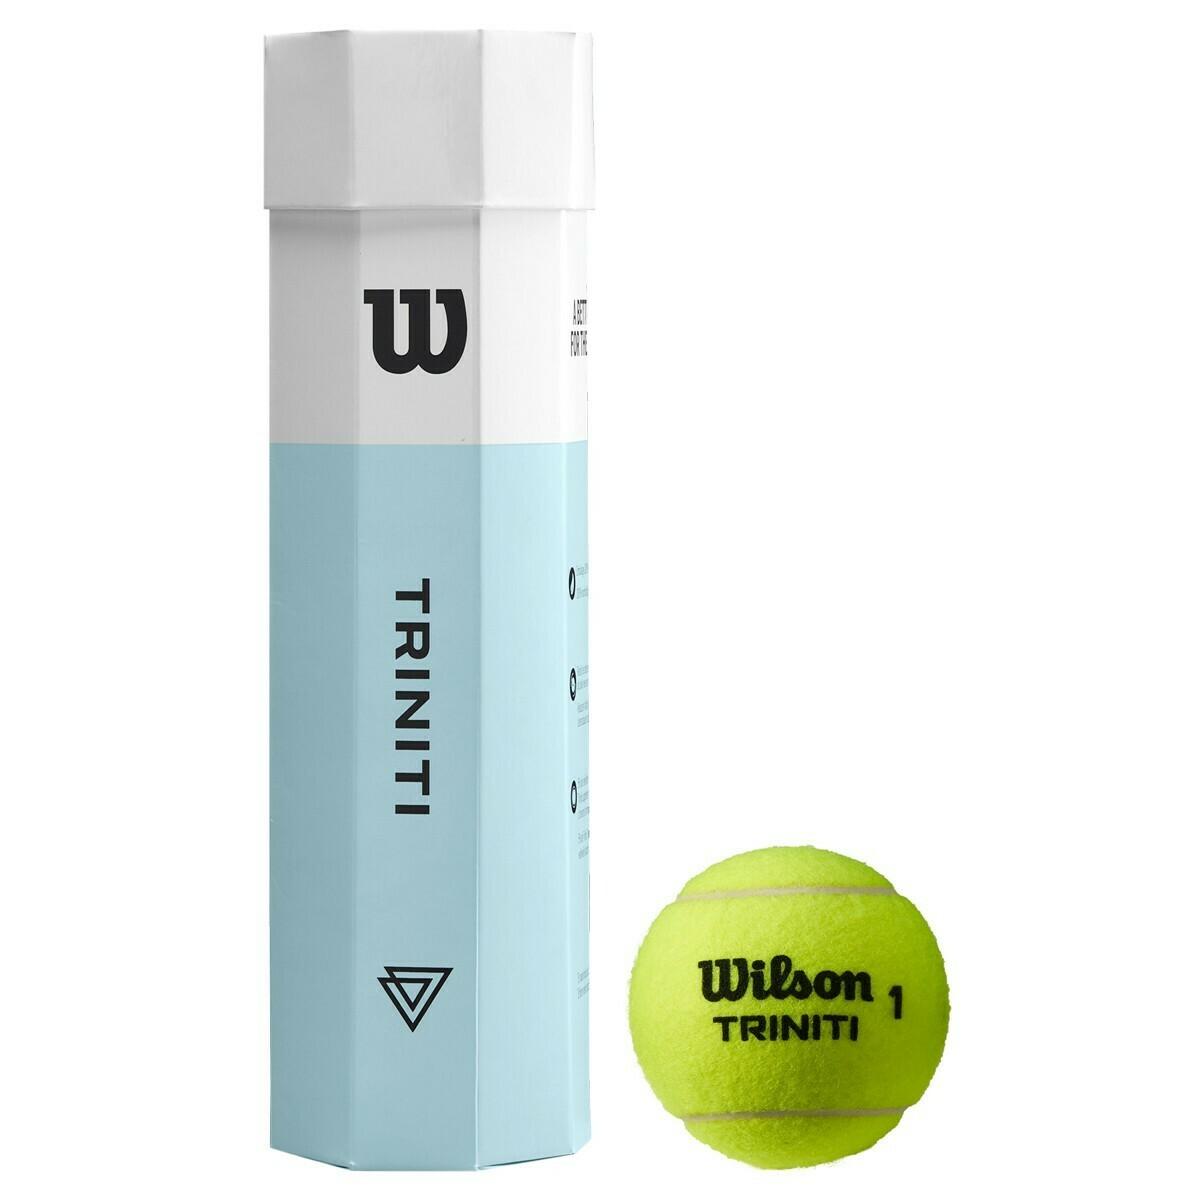 Wilson Triniti Tennis Balls - 4 Ball Tube